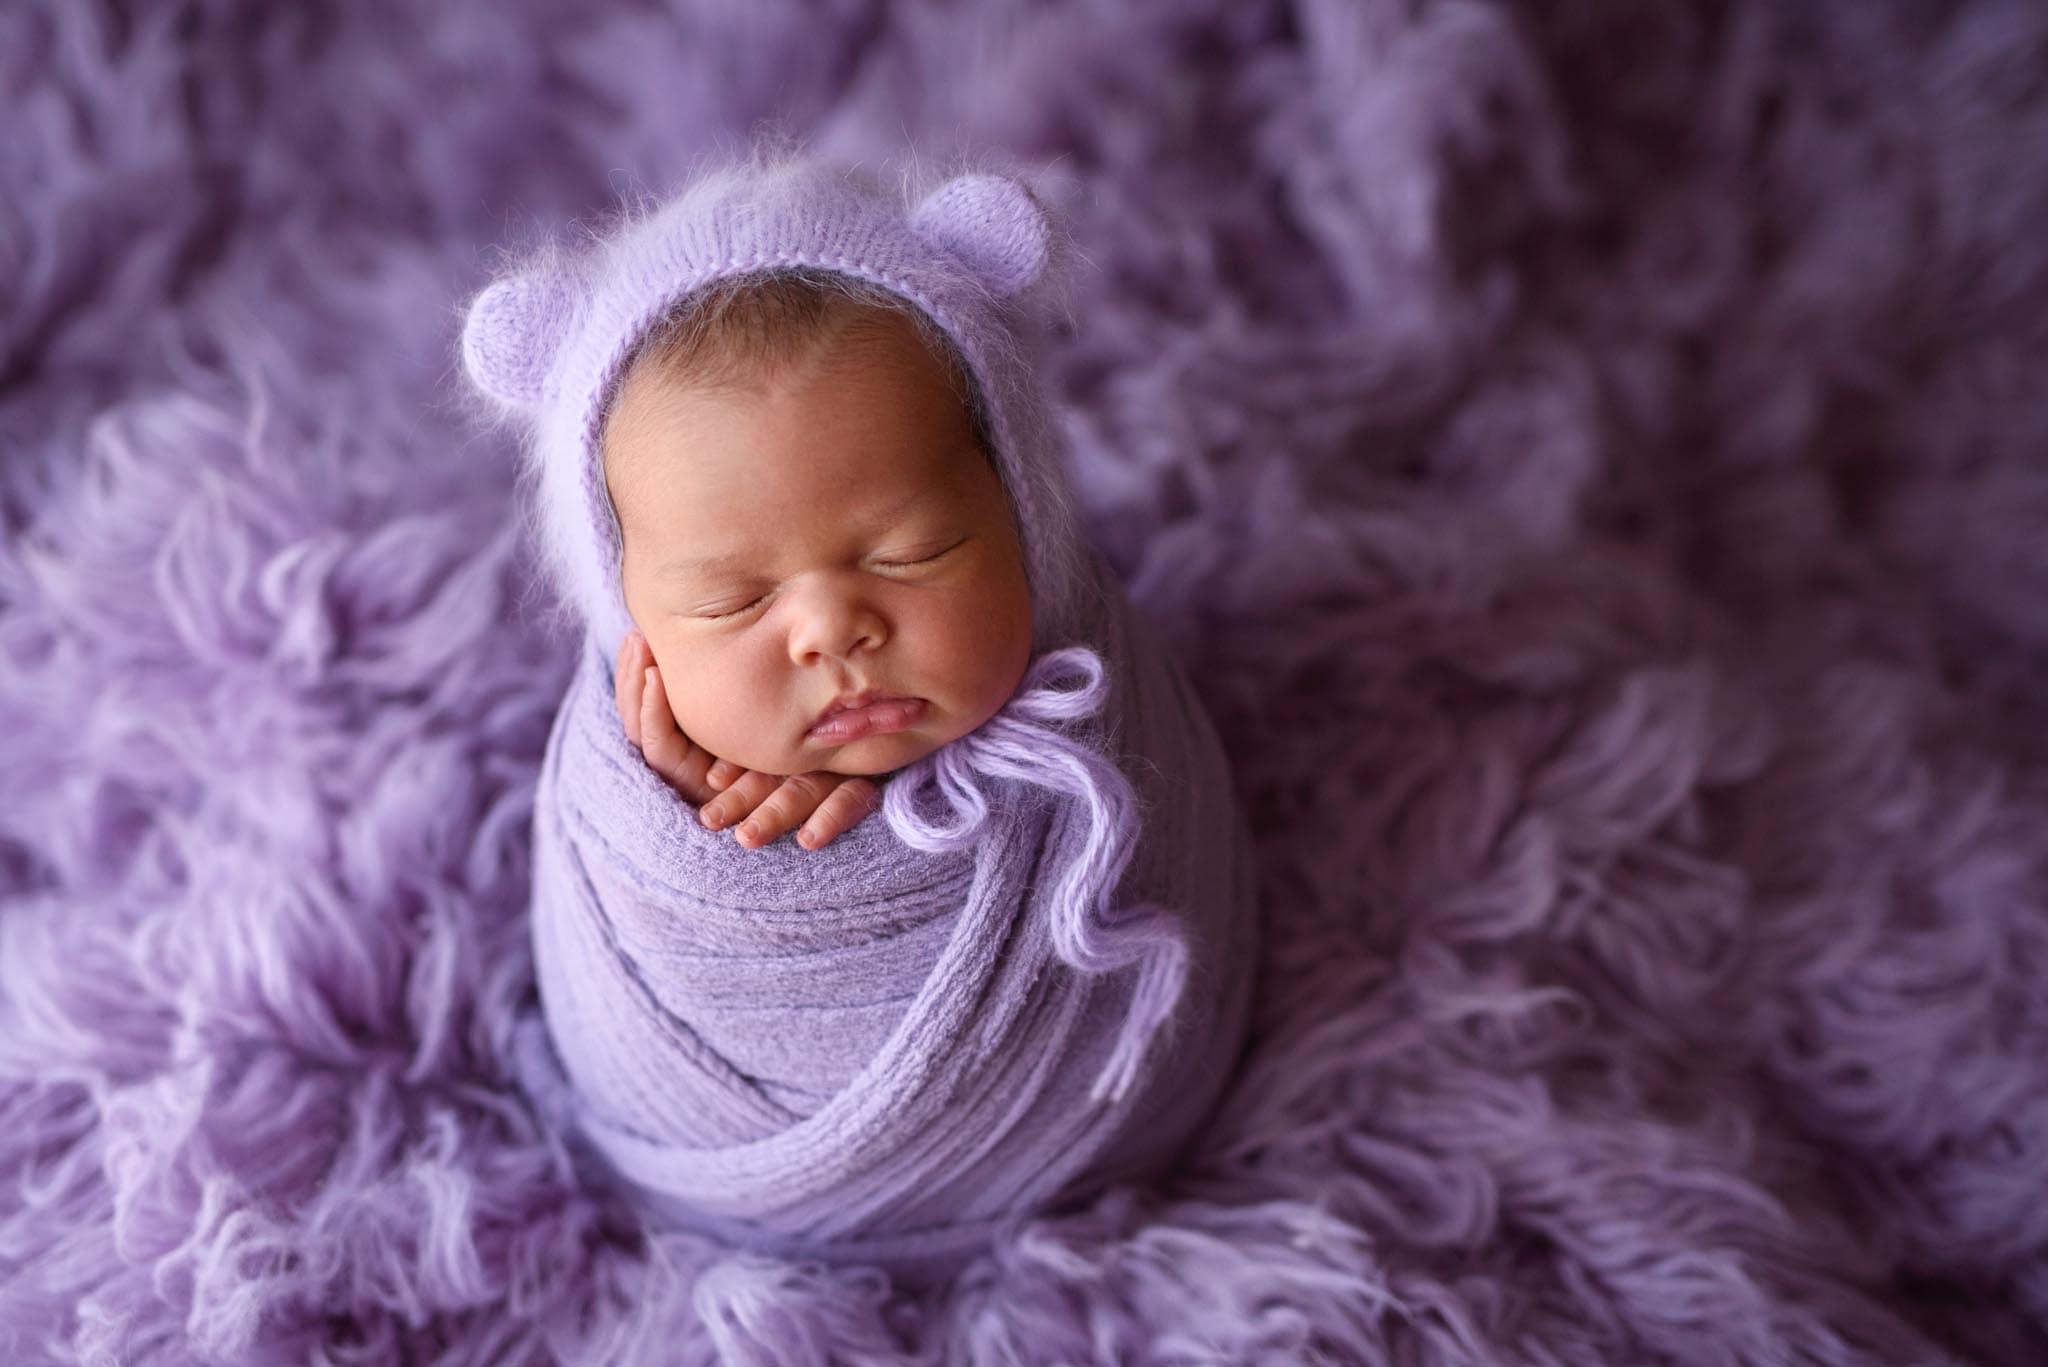 Baby photo of newborn girl swaddled up in purple wearing a purple angora bear hat